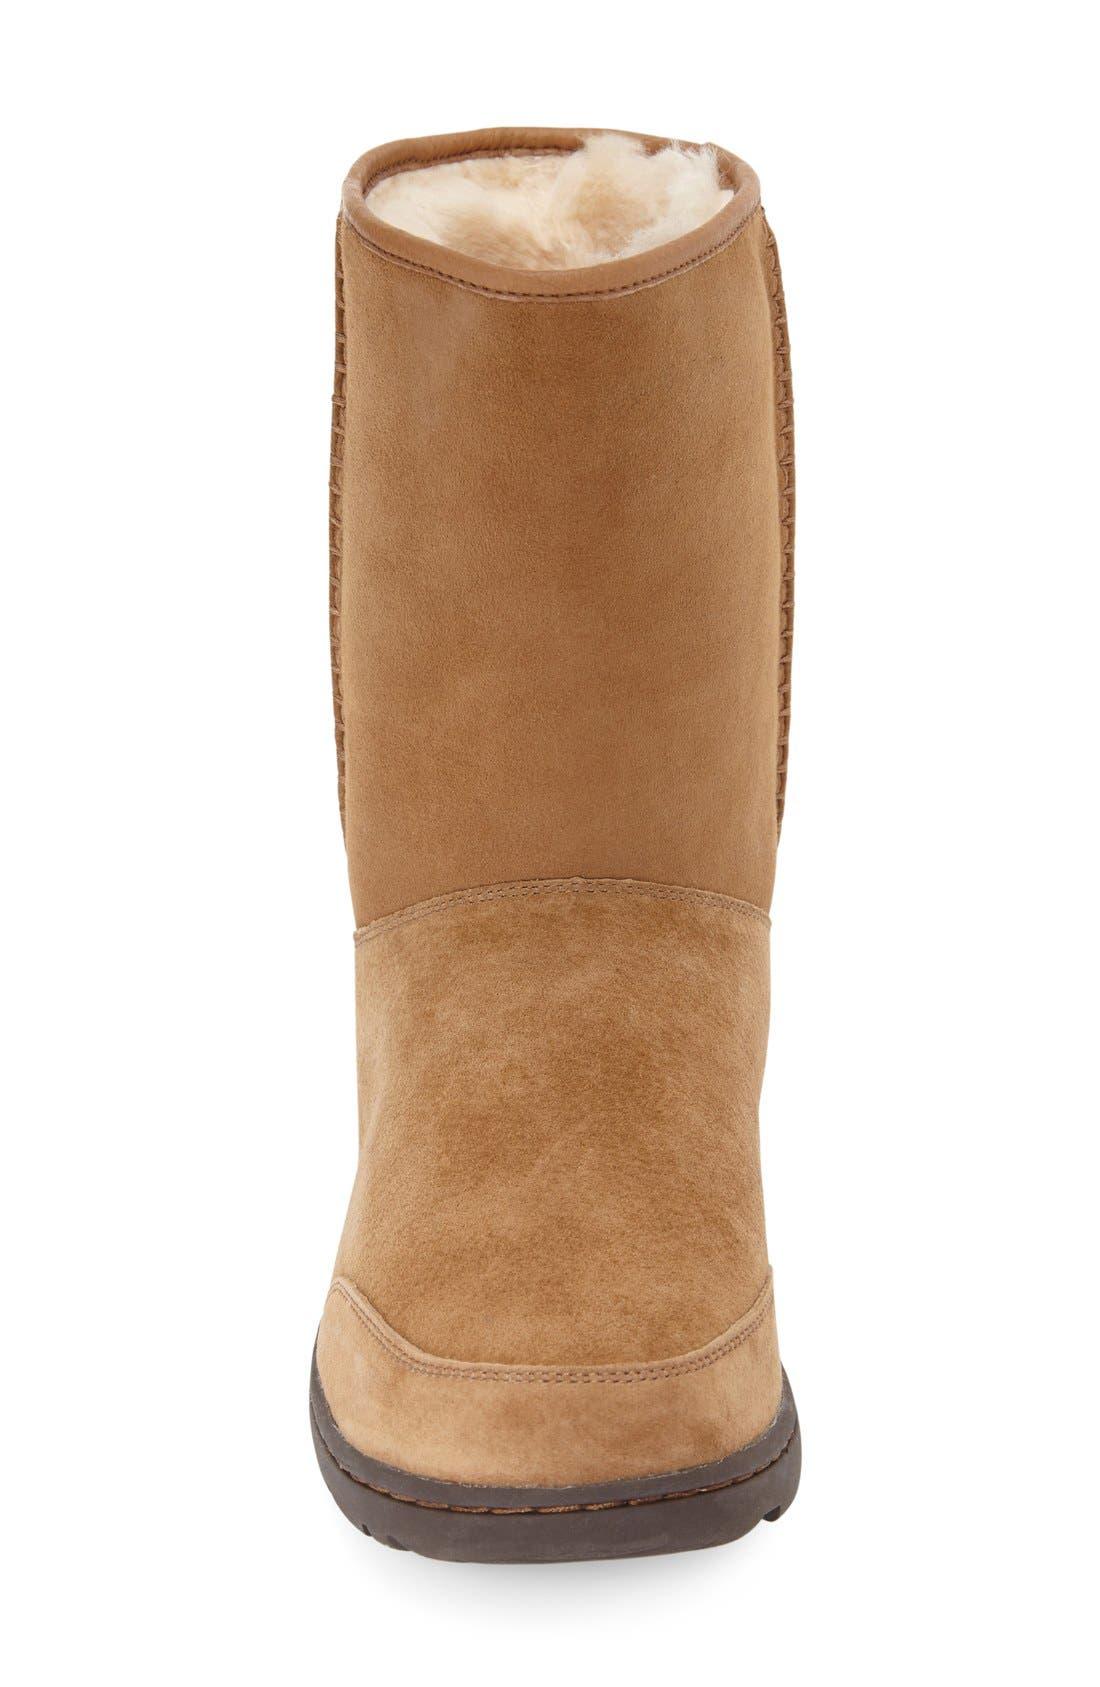 Alternate Image 3  - UGG®Michaela Waterproof Suede Boot (Women)